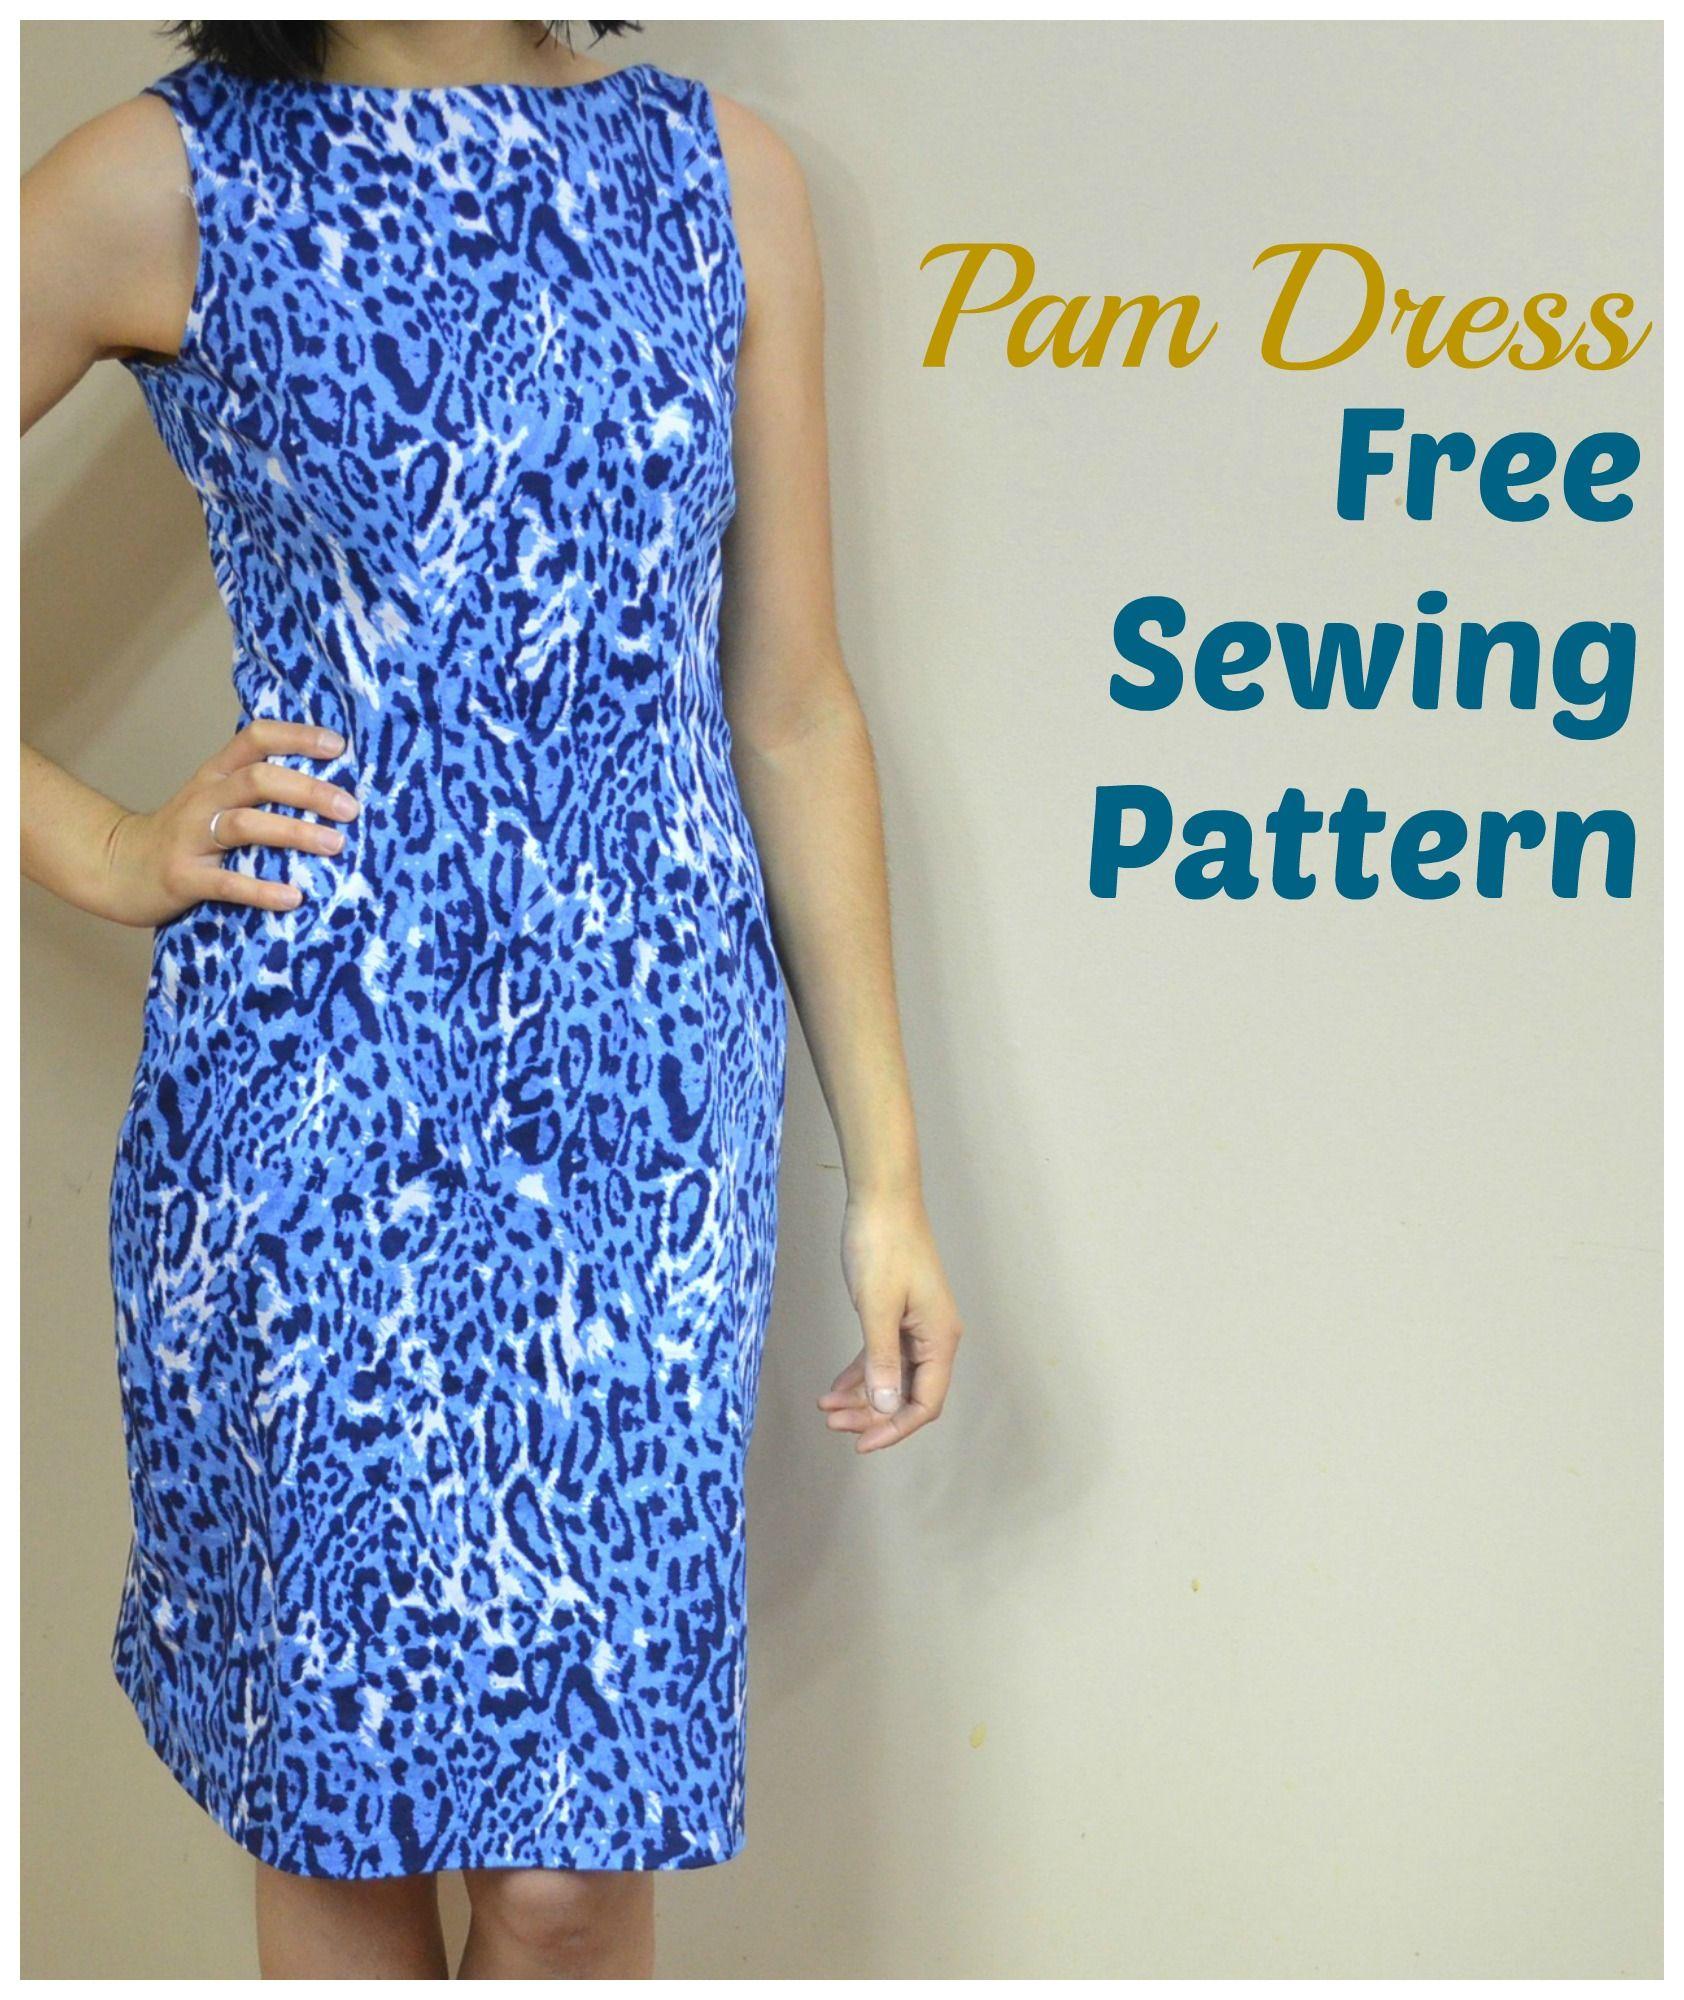 Pam Dress Pattern | Nähen schnittmuster, Kleidung nähen und Freebooks